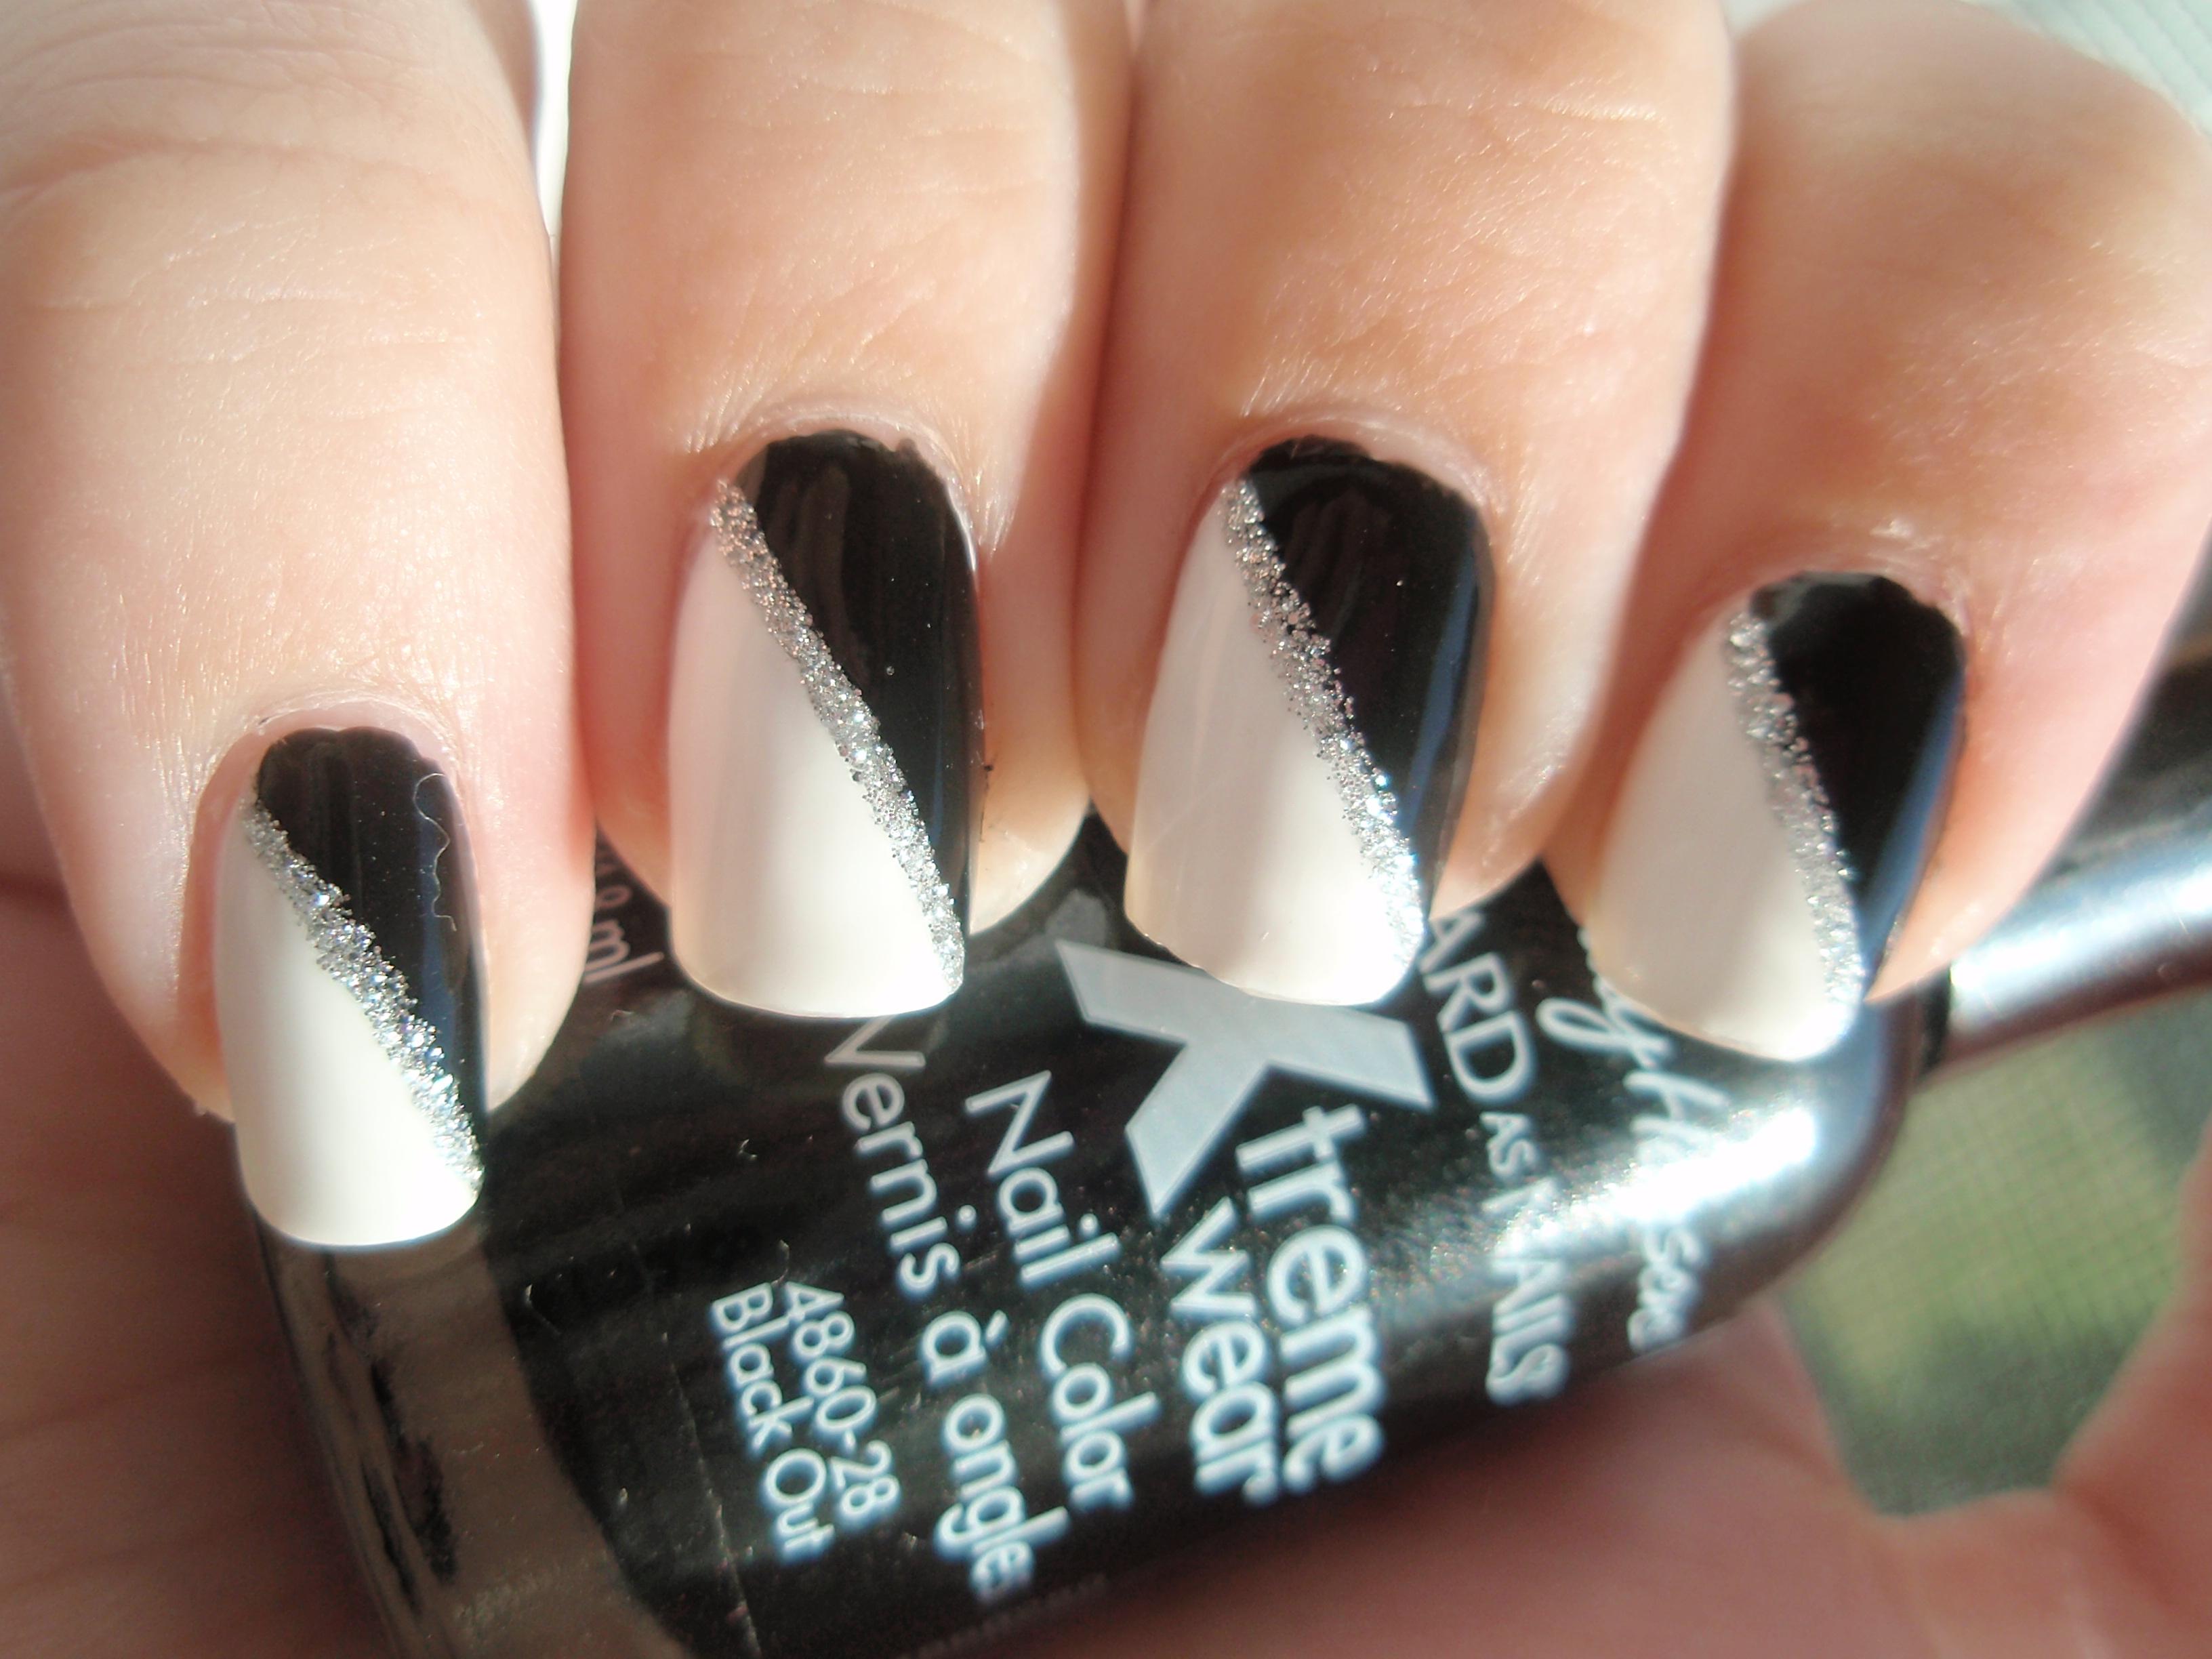 11 White Nail Polish Designs Images - White Nail Polish ...